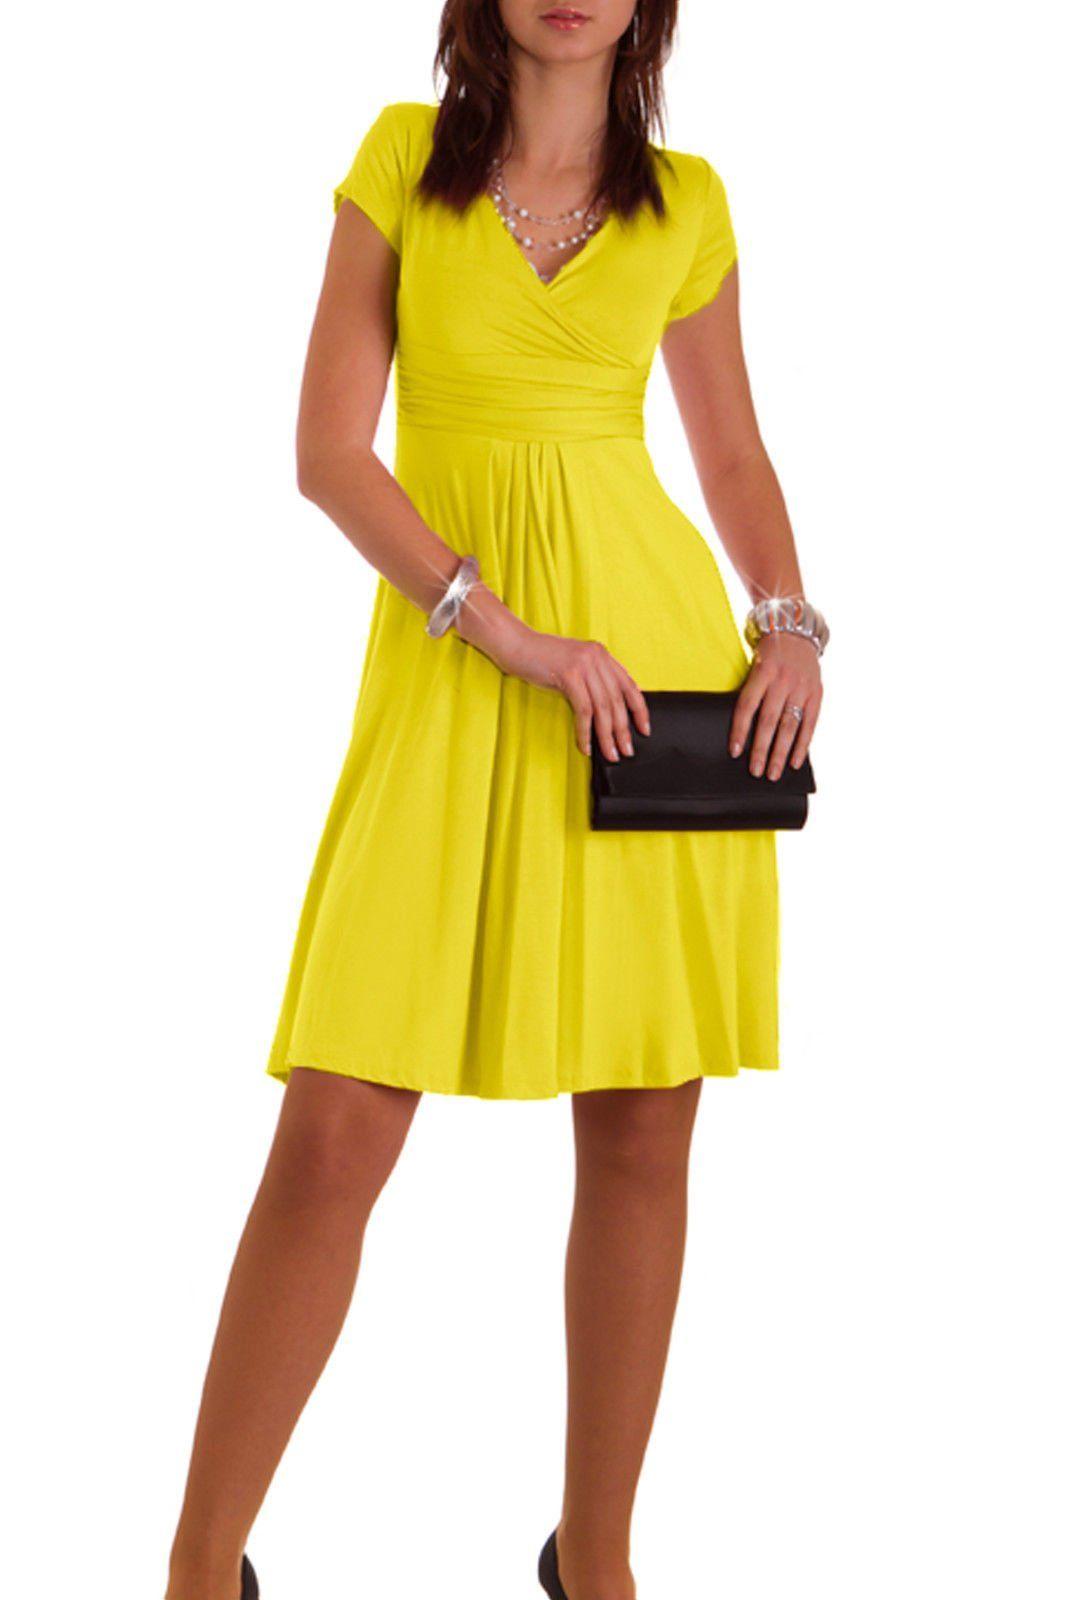 Exact Colour Yellow Size Xl 2xl X2022 Uk 14 16 X2022 Eu 42 44 X2022 Us 12 14 Yellow Dress Dresses Mini Dress